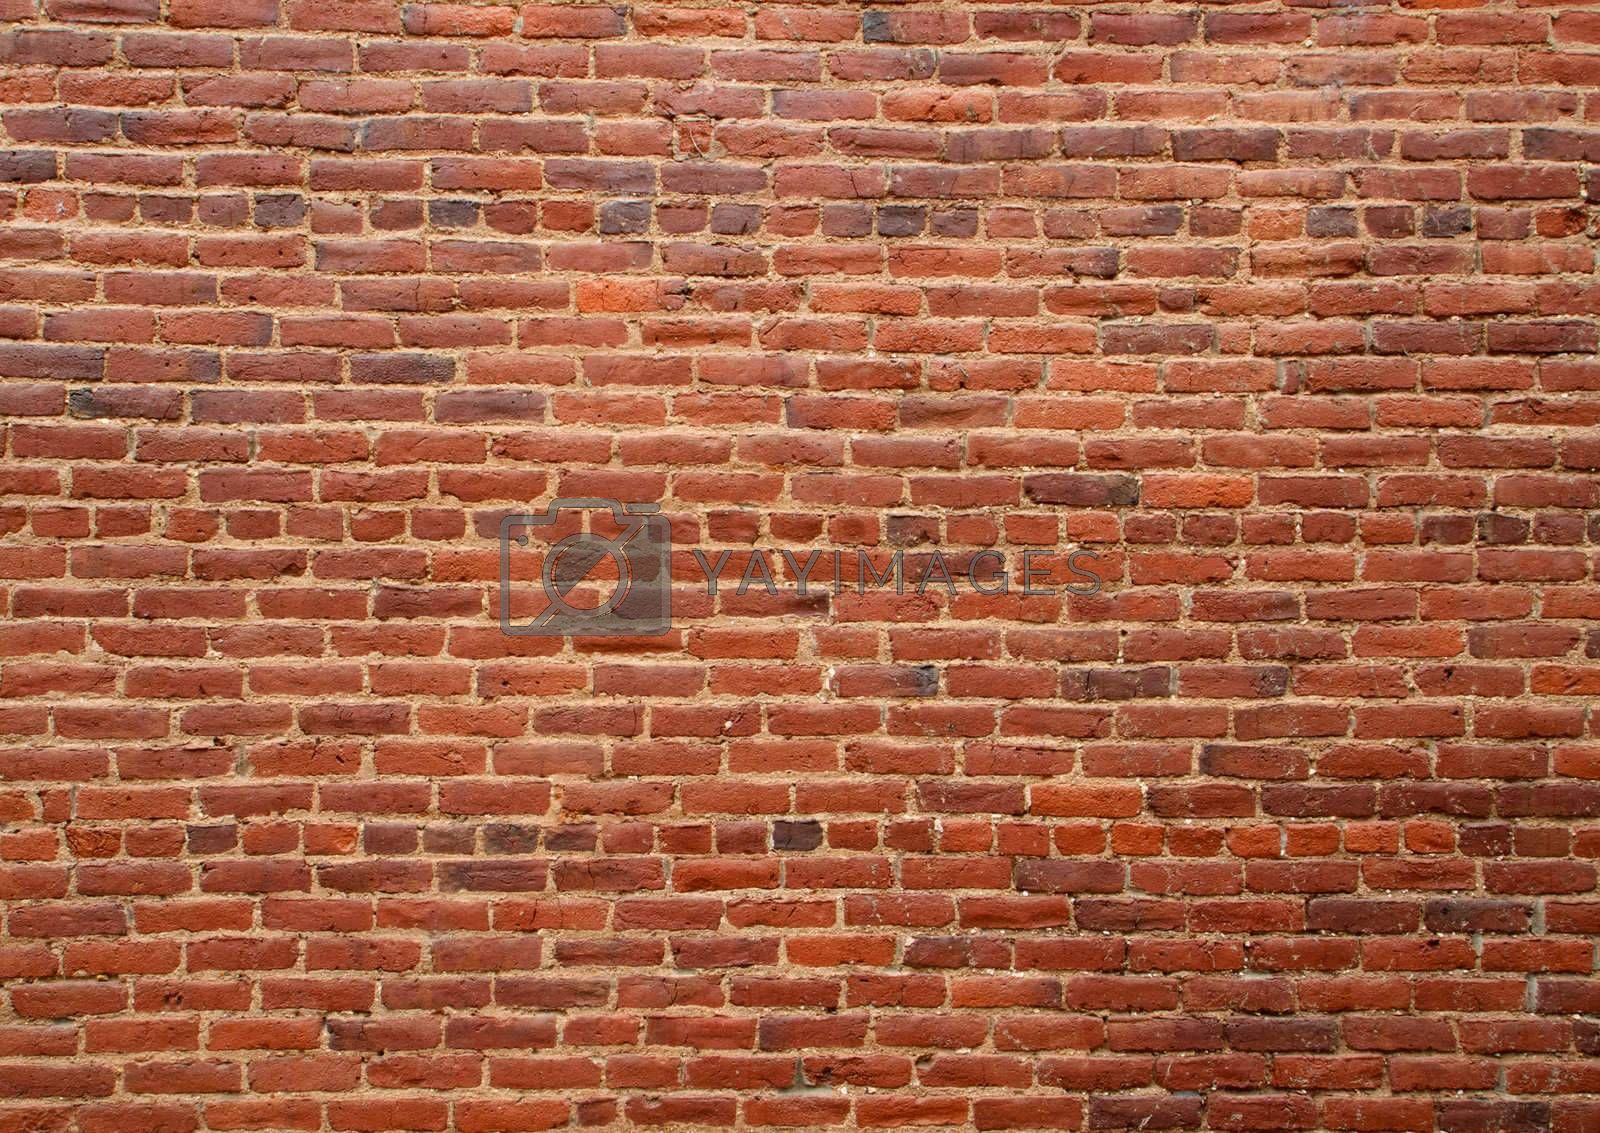 Royalty free image of Old red brick wall by bobkeenan